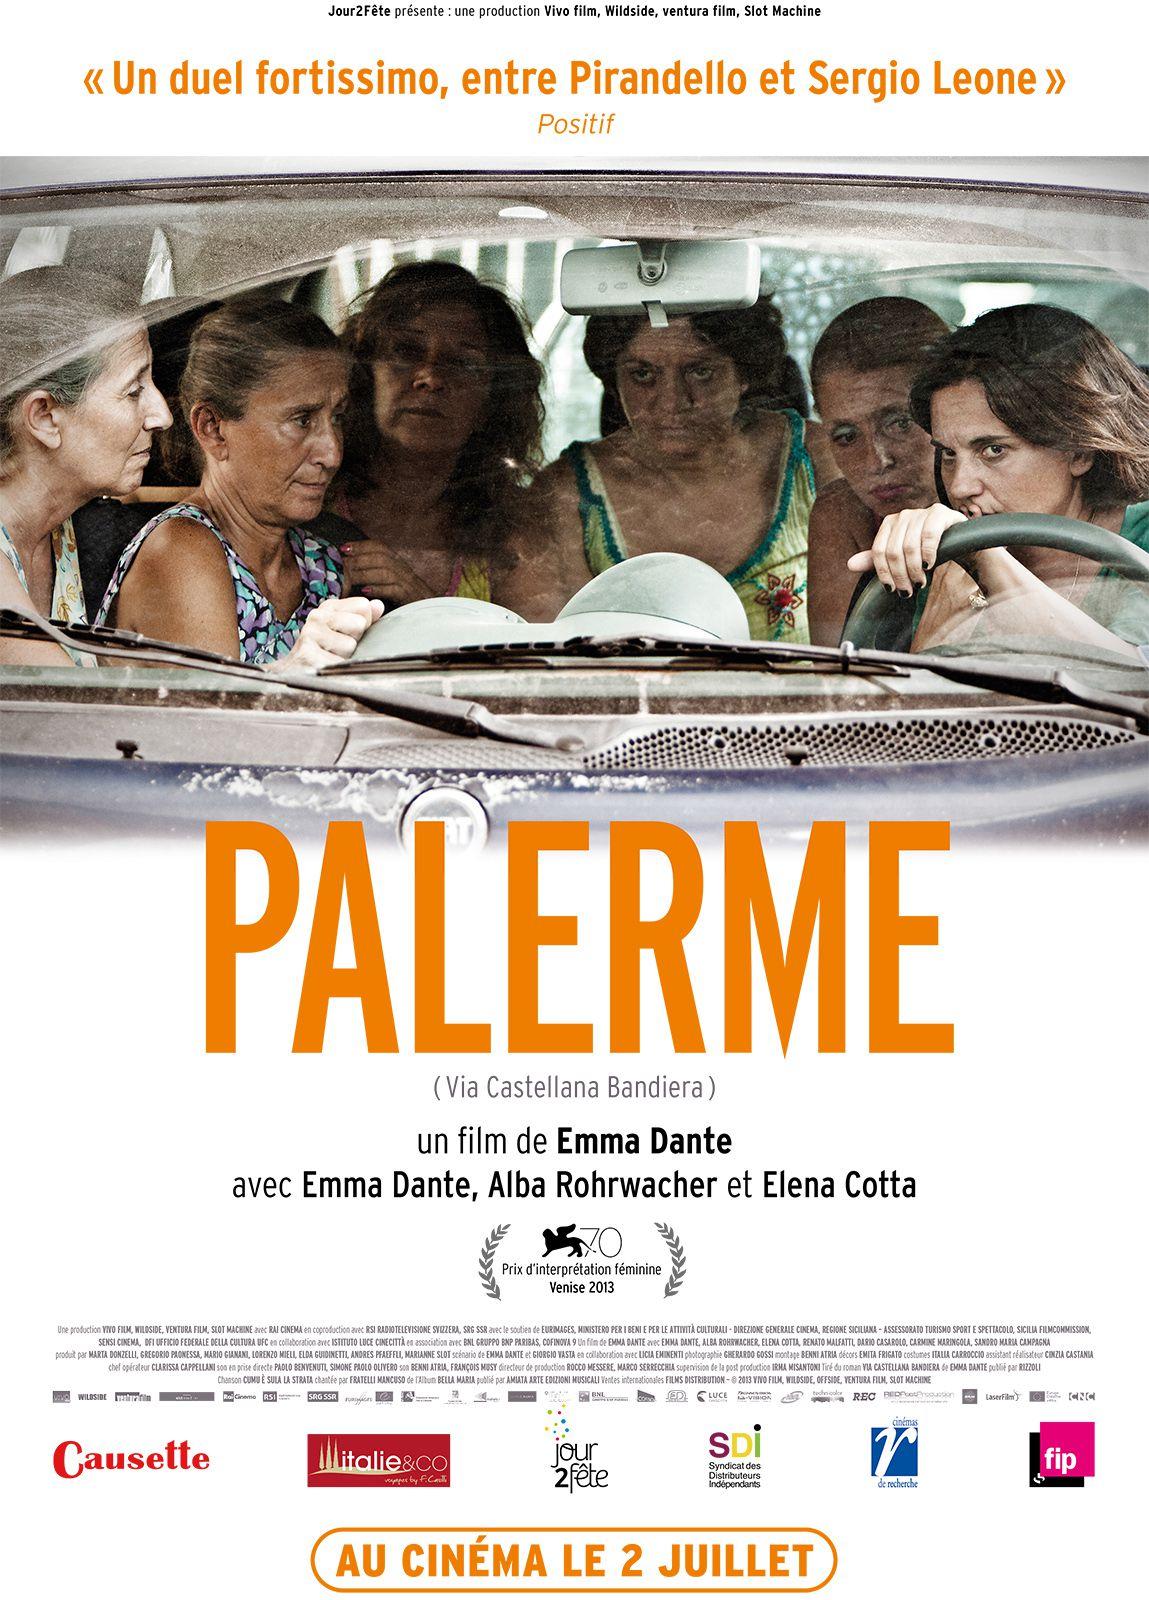 Palerme - Film (2013)